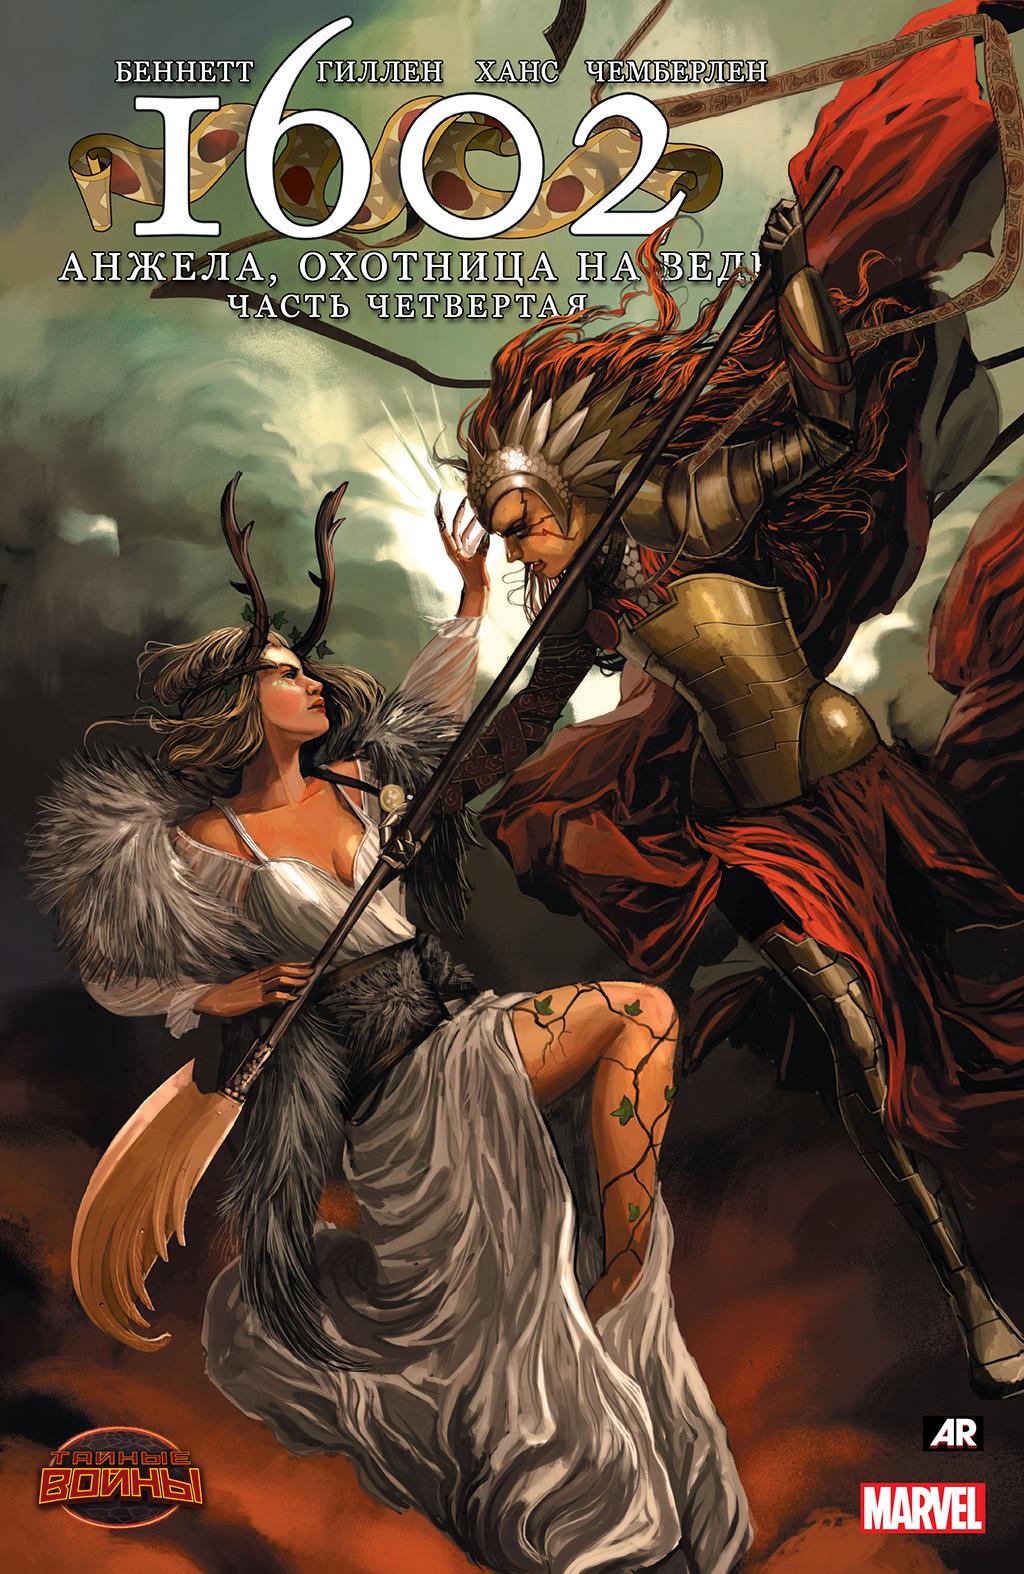 Комикс 1602: Анжела, охотница на ведьм